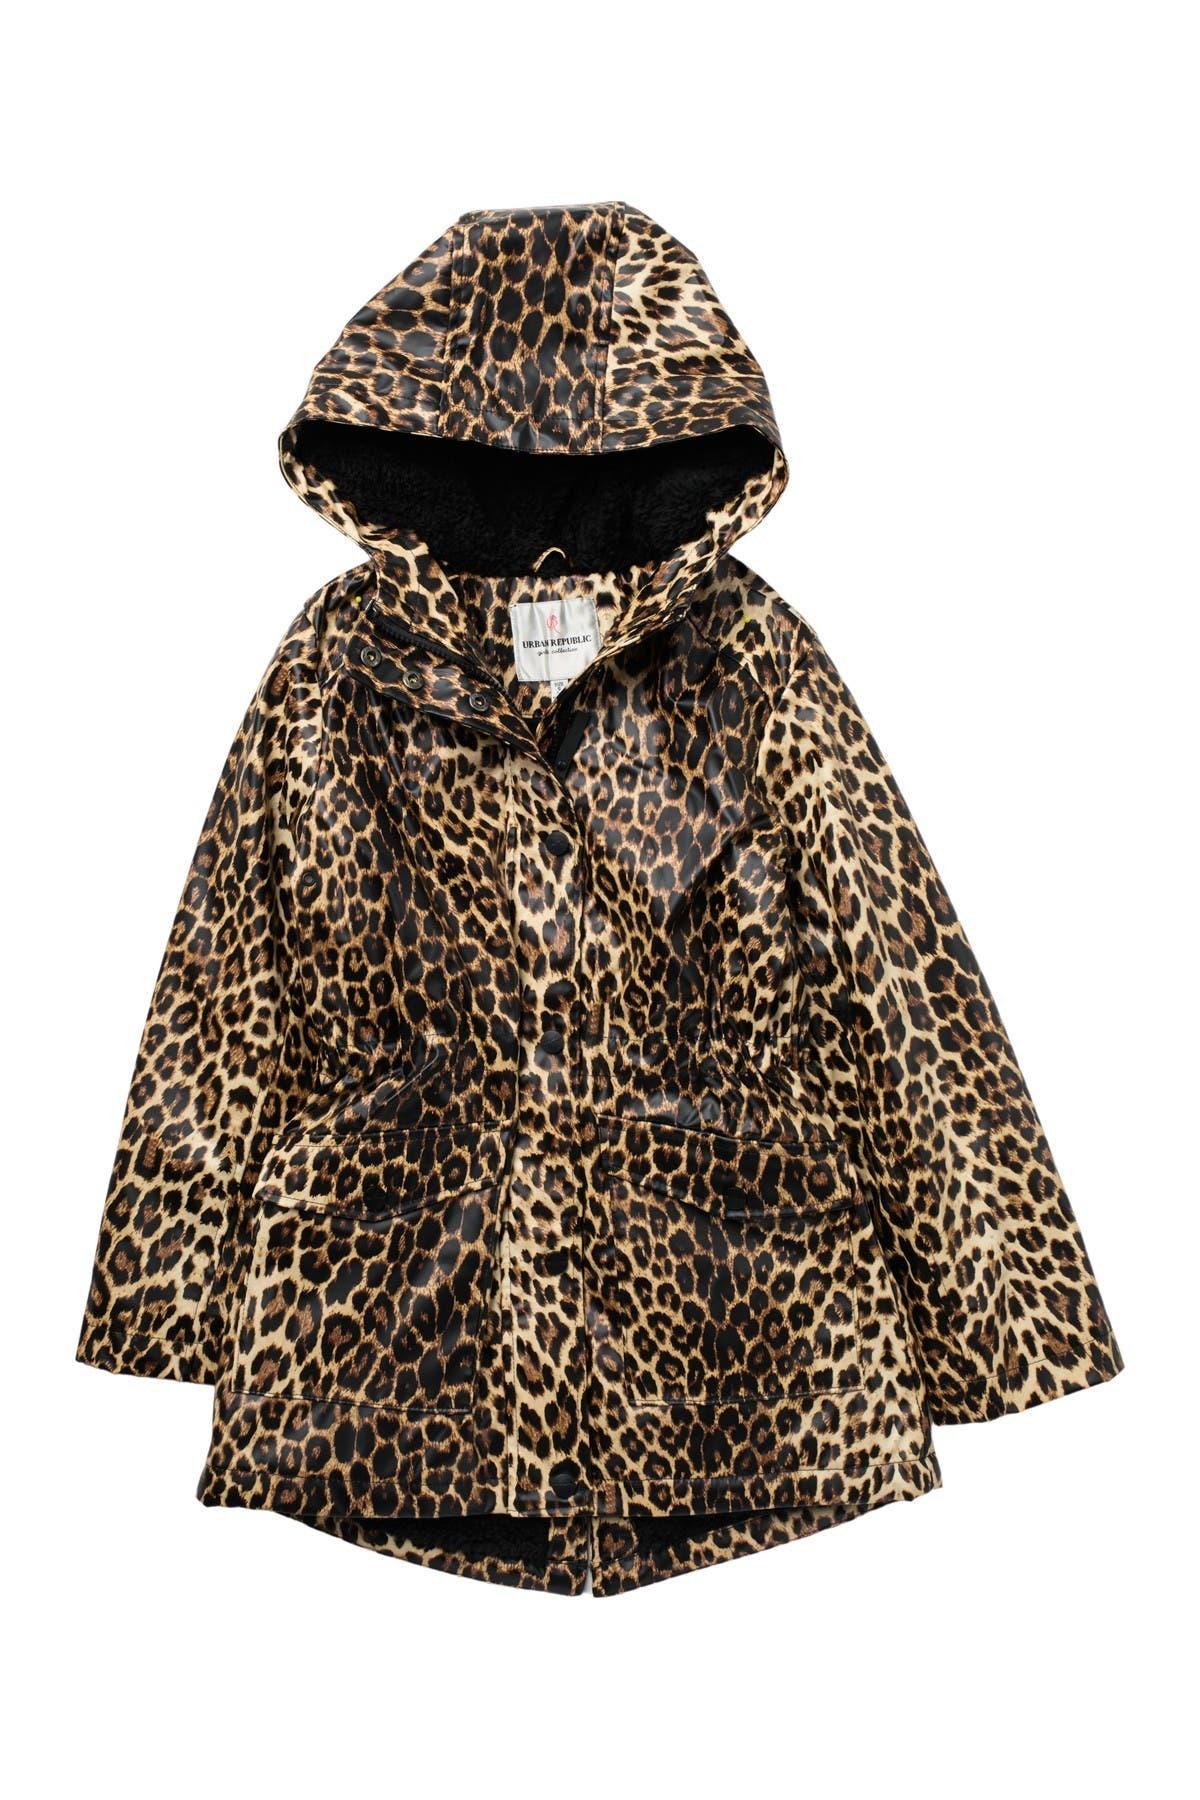 Image of Urban Republic Fleece Lined Raincoat Anorak Jacket